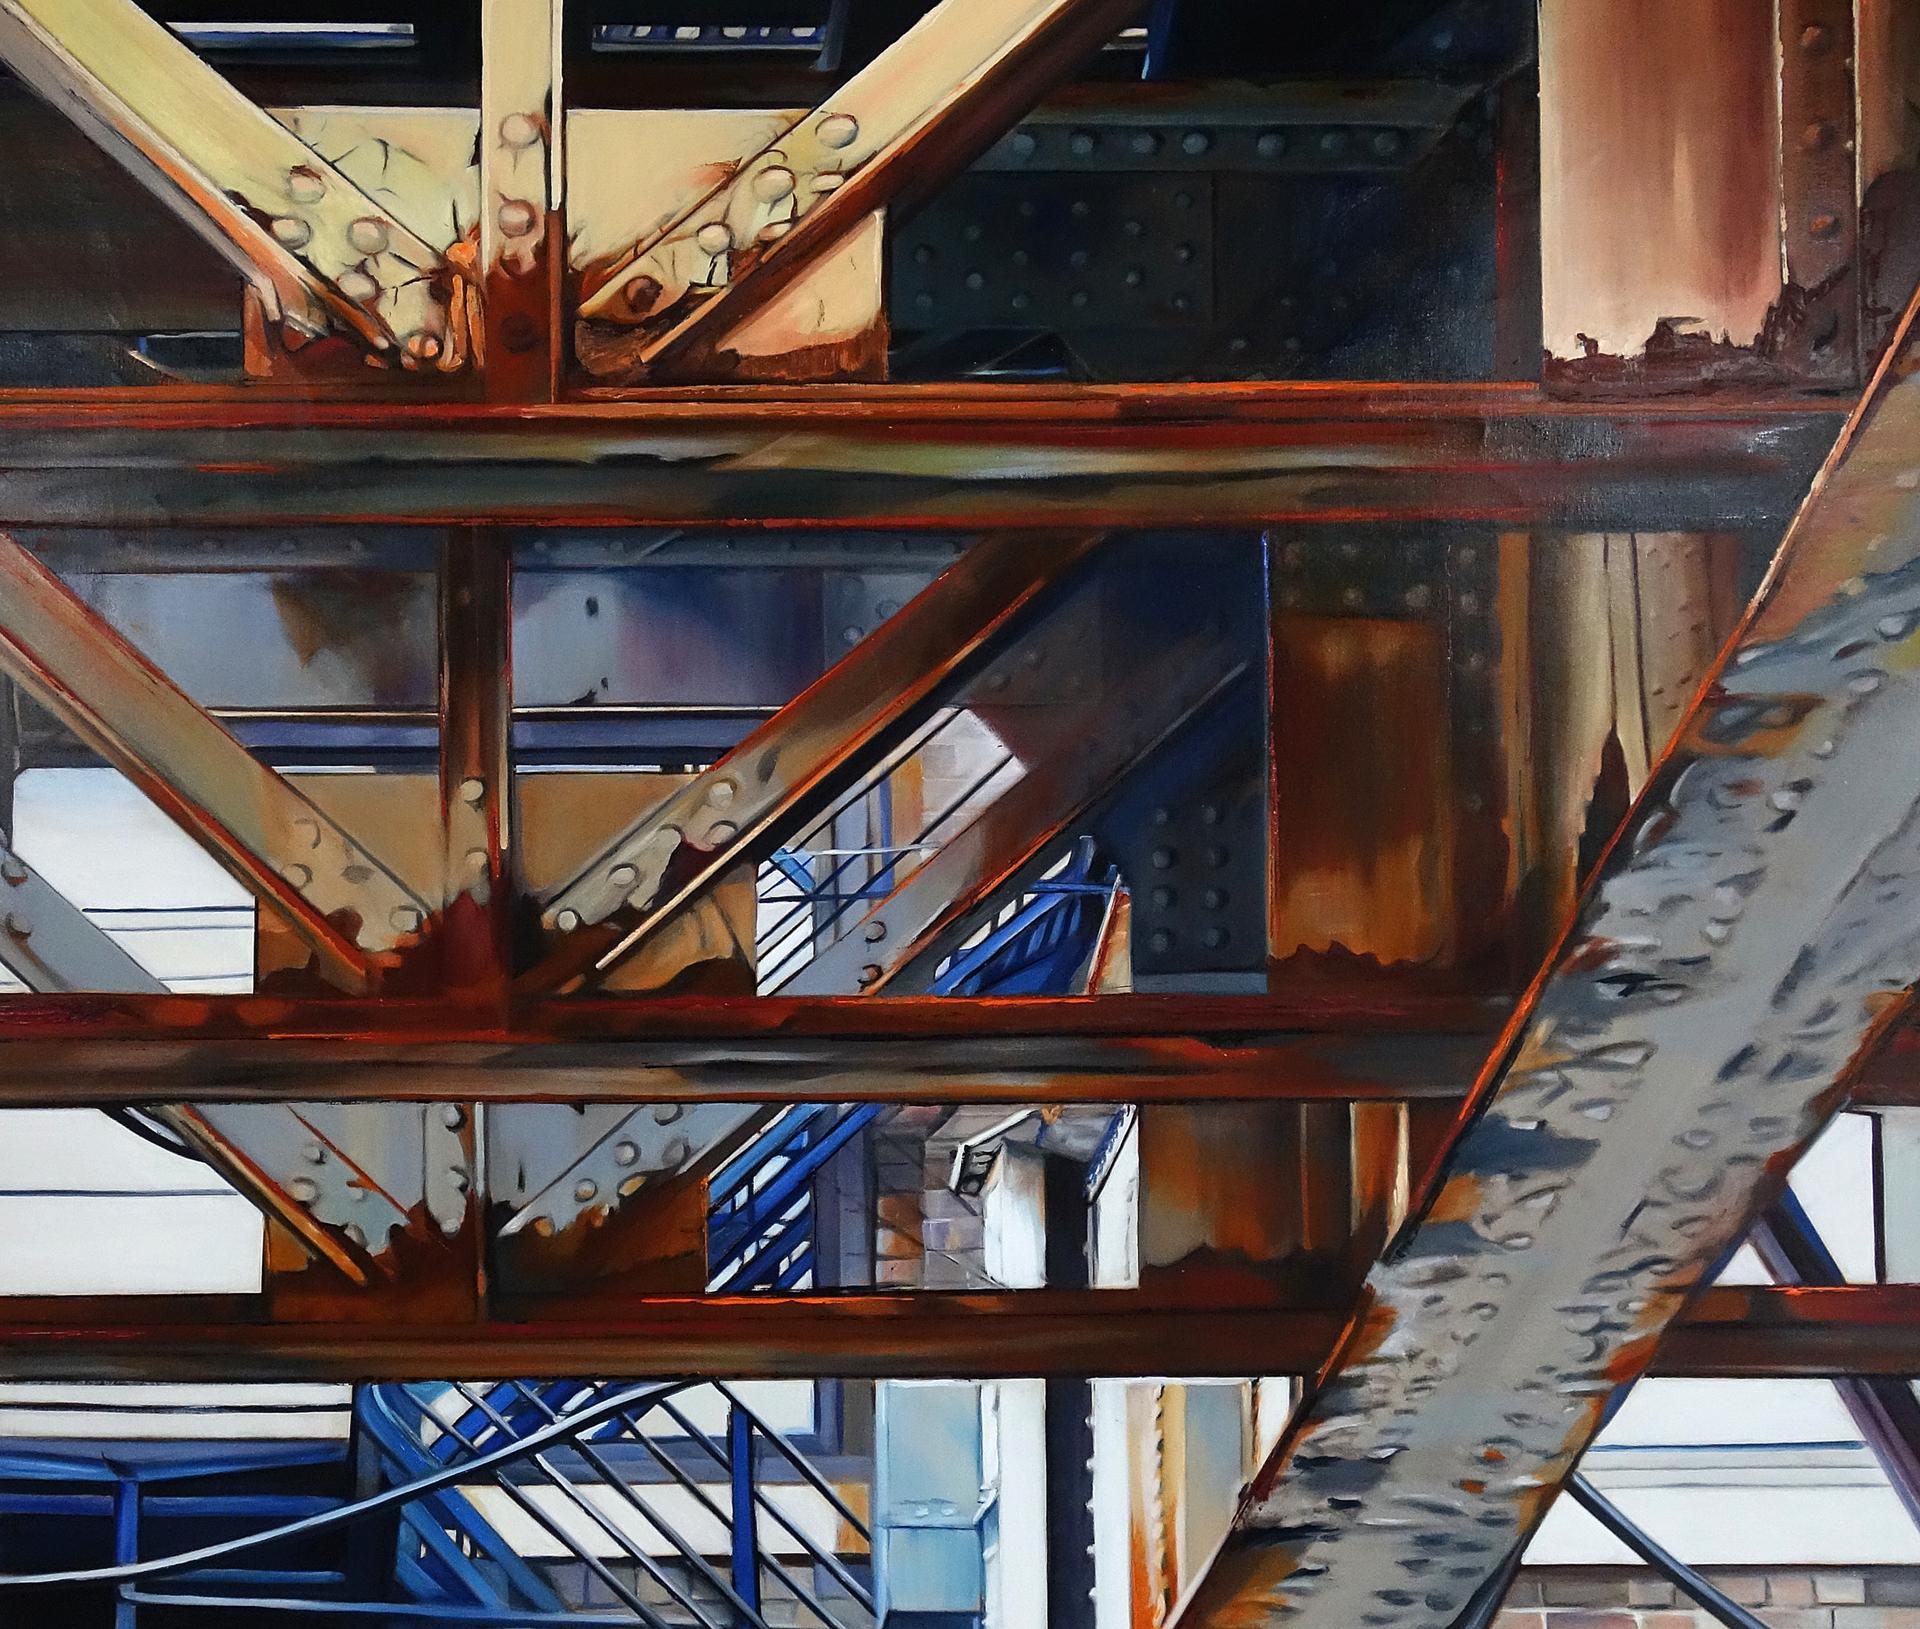 Blue Stairs Under the El by Allan Gorman